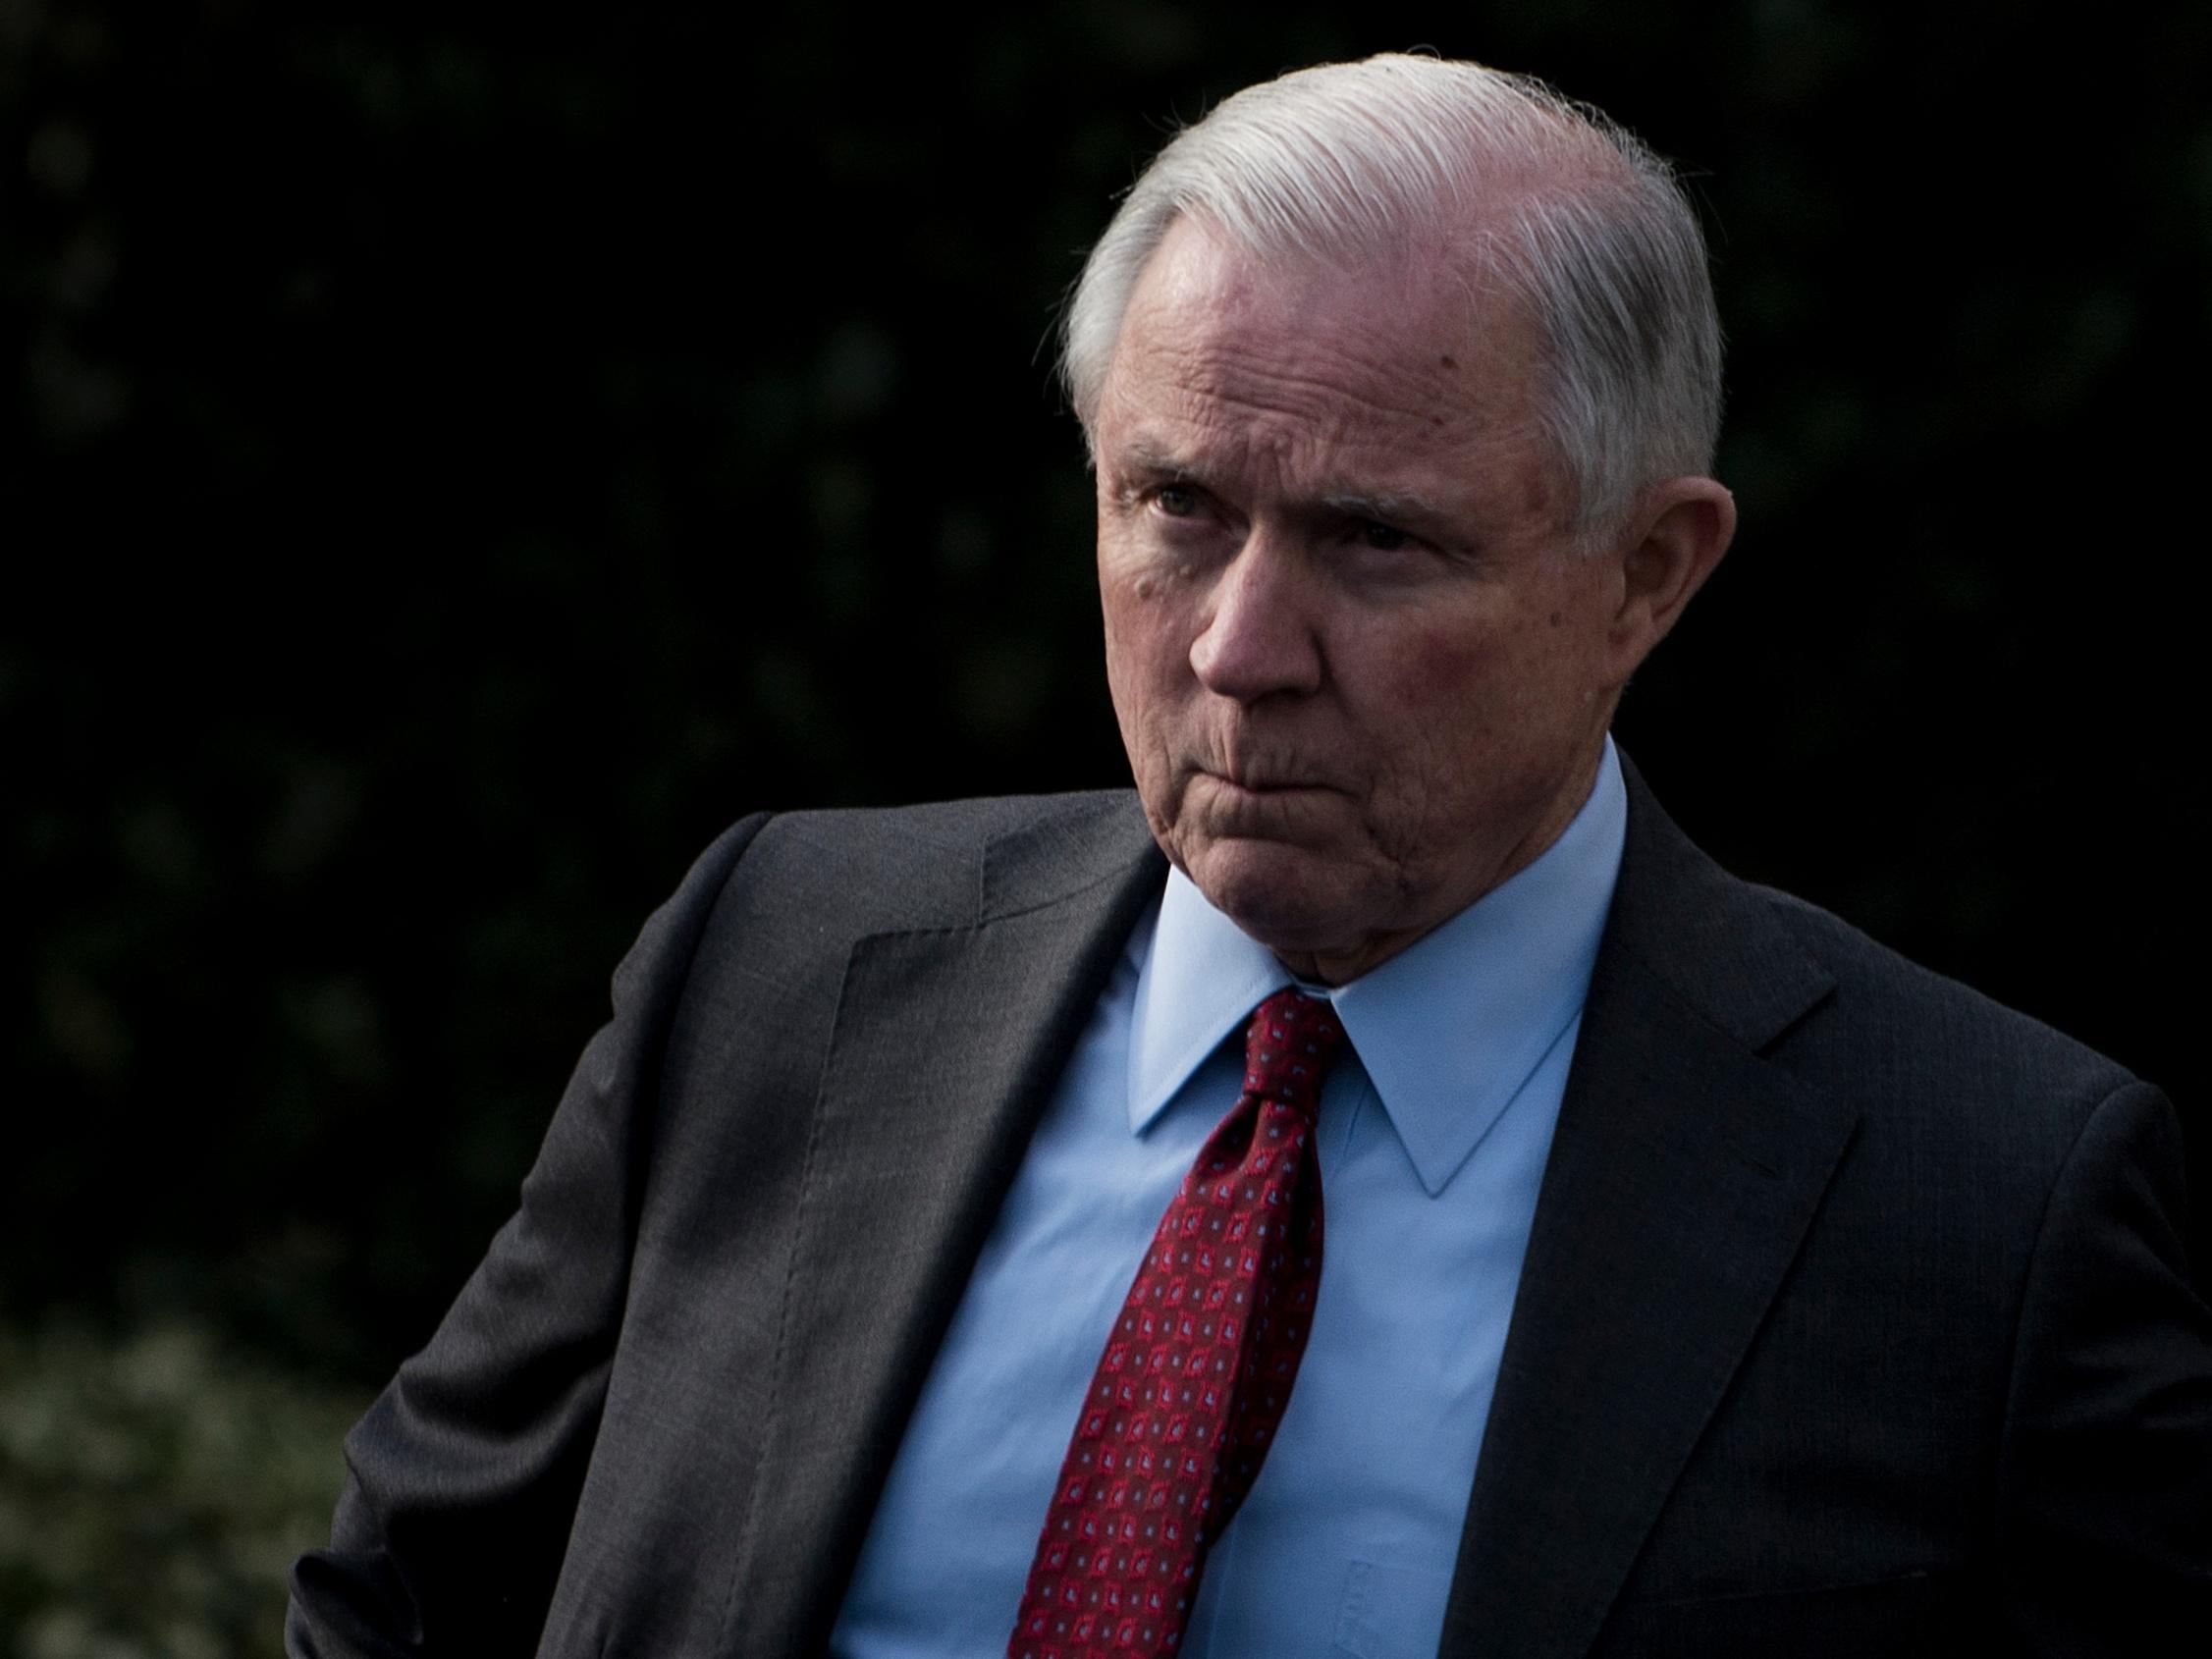 Attorney General Rescinds Obama-Era Marijuana Guidelines